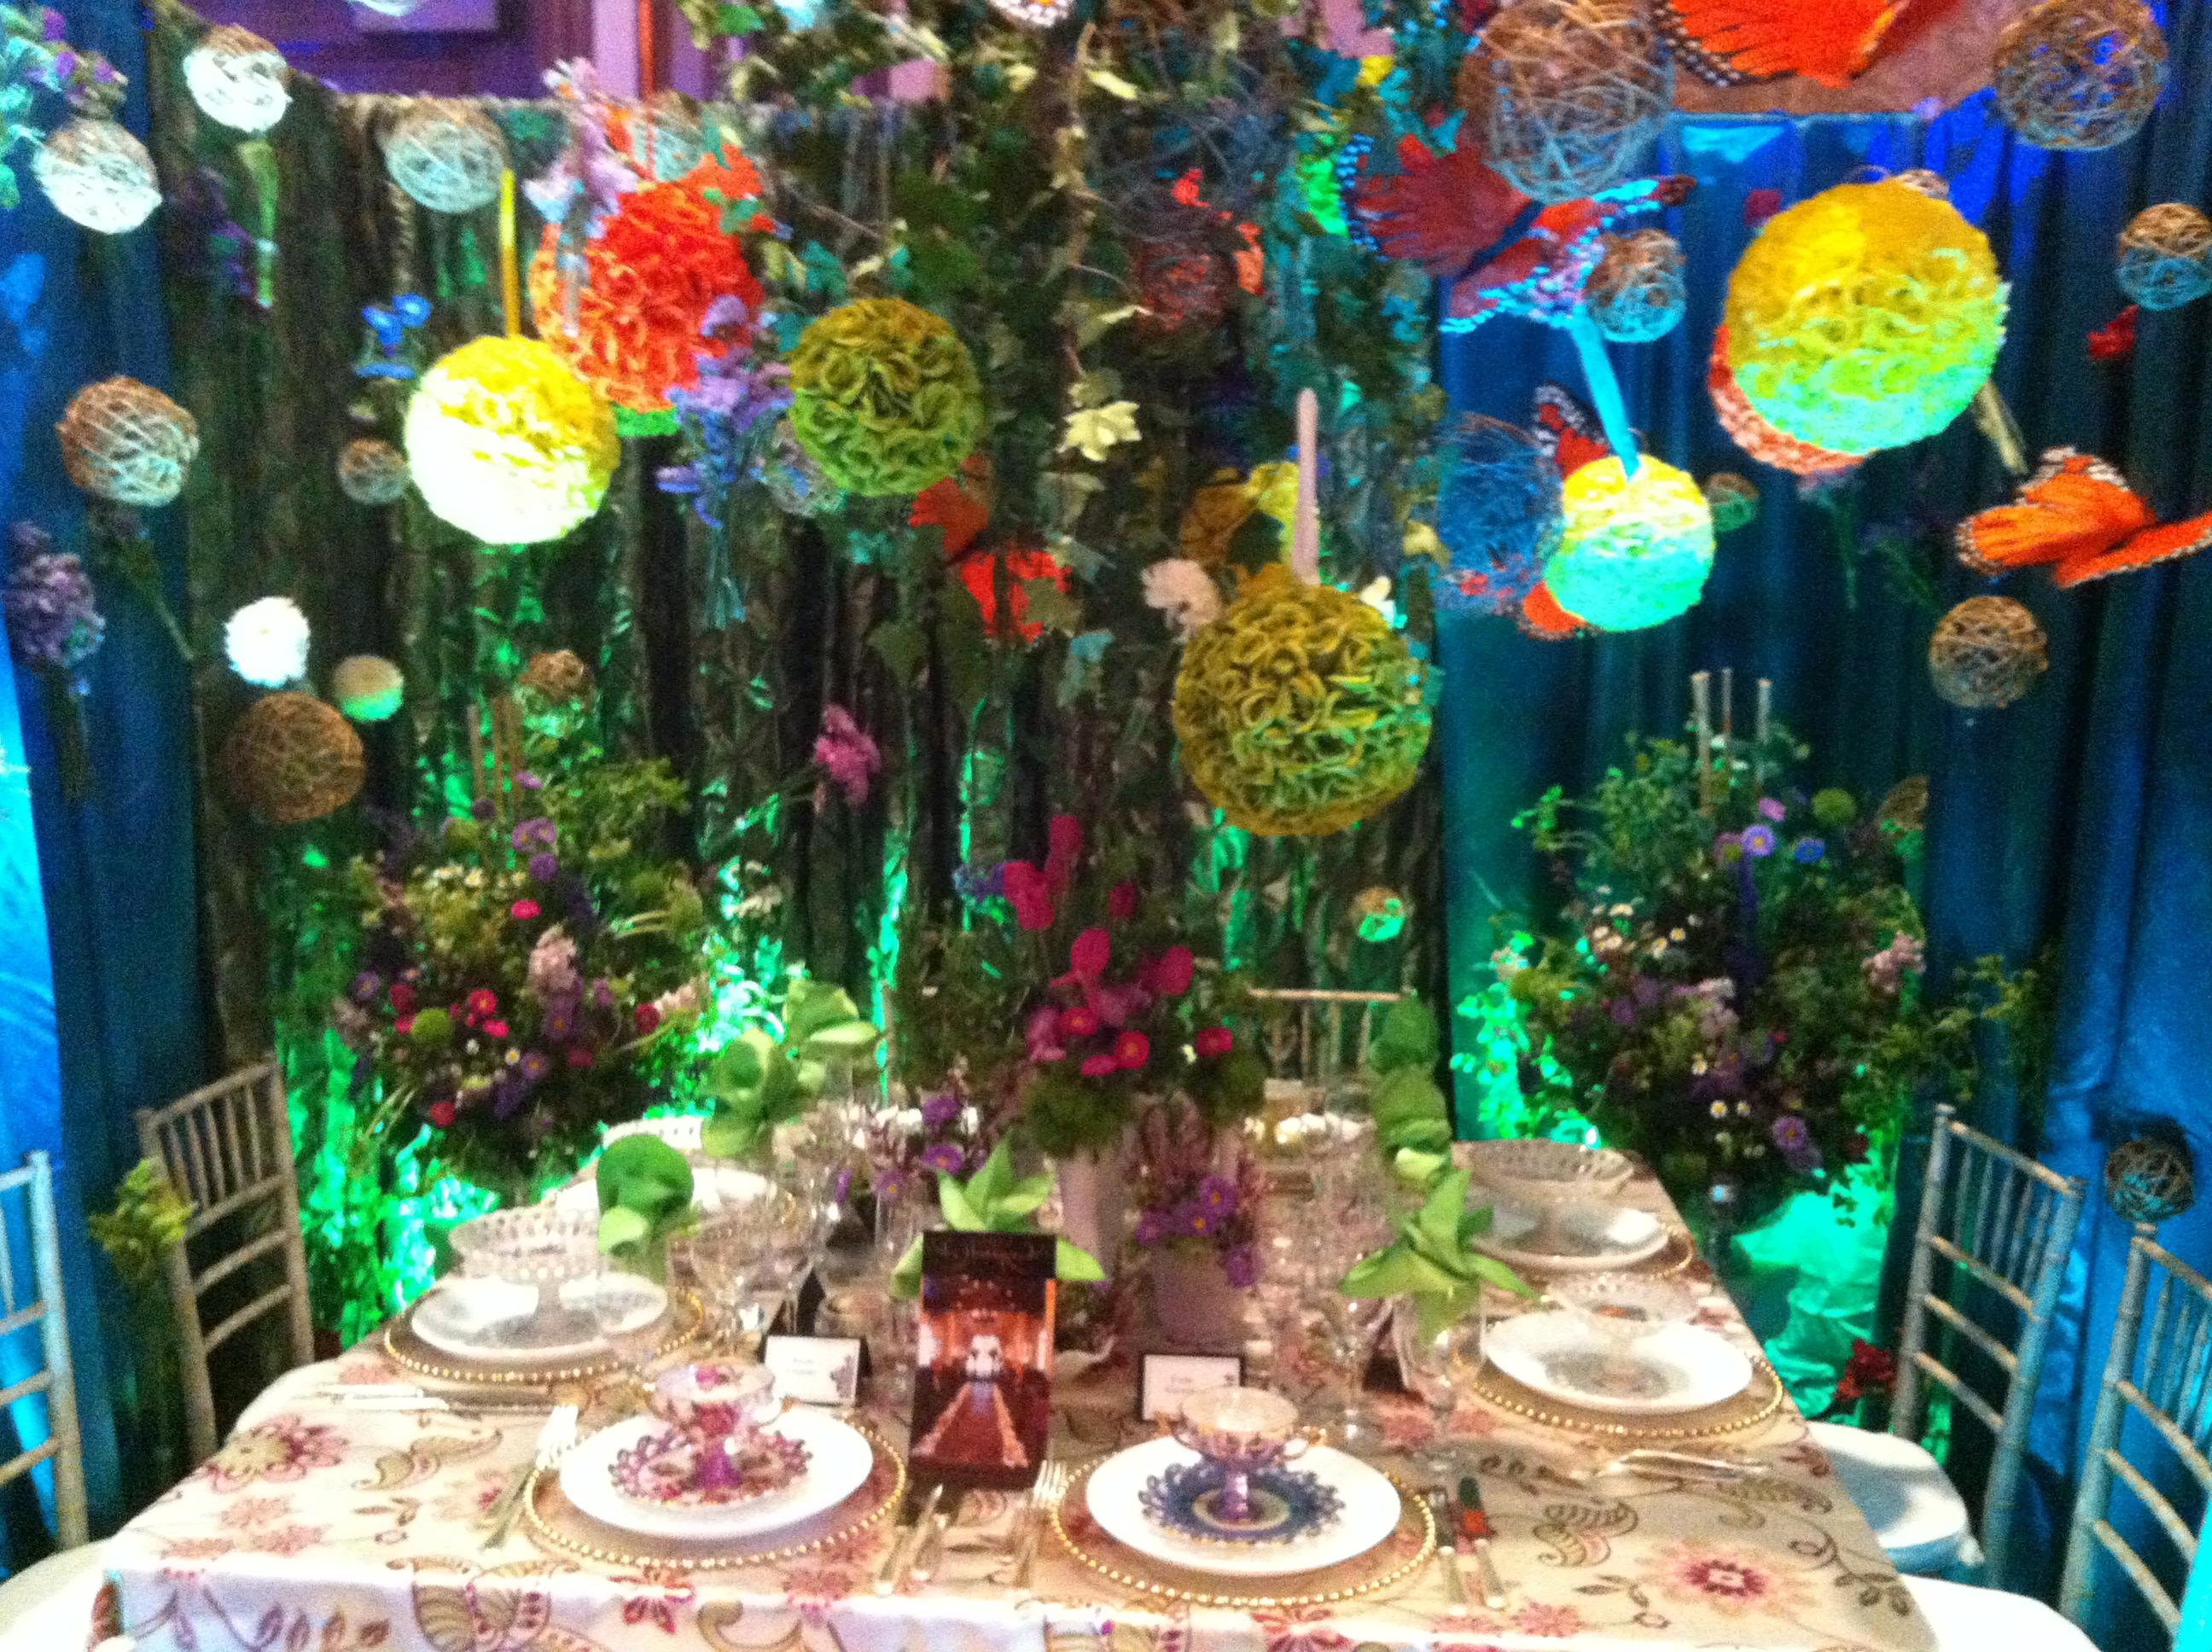 Whimsical Garden Wedding | JMT Eventology on Whimsical Backyard Ideas id=85084